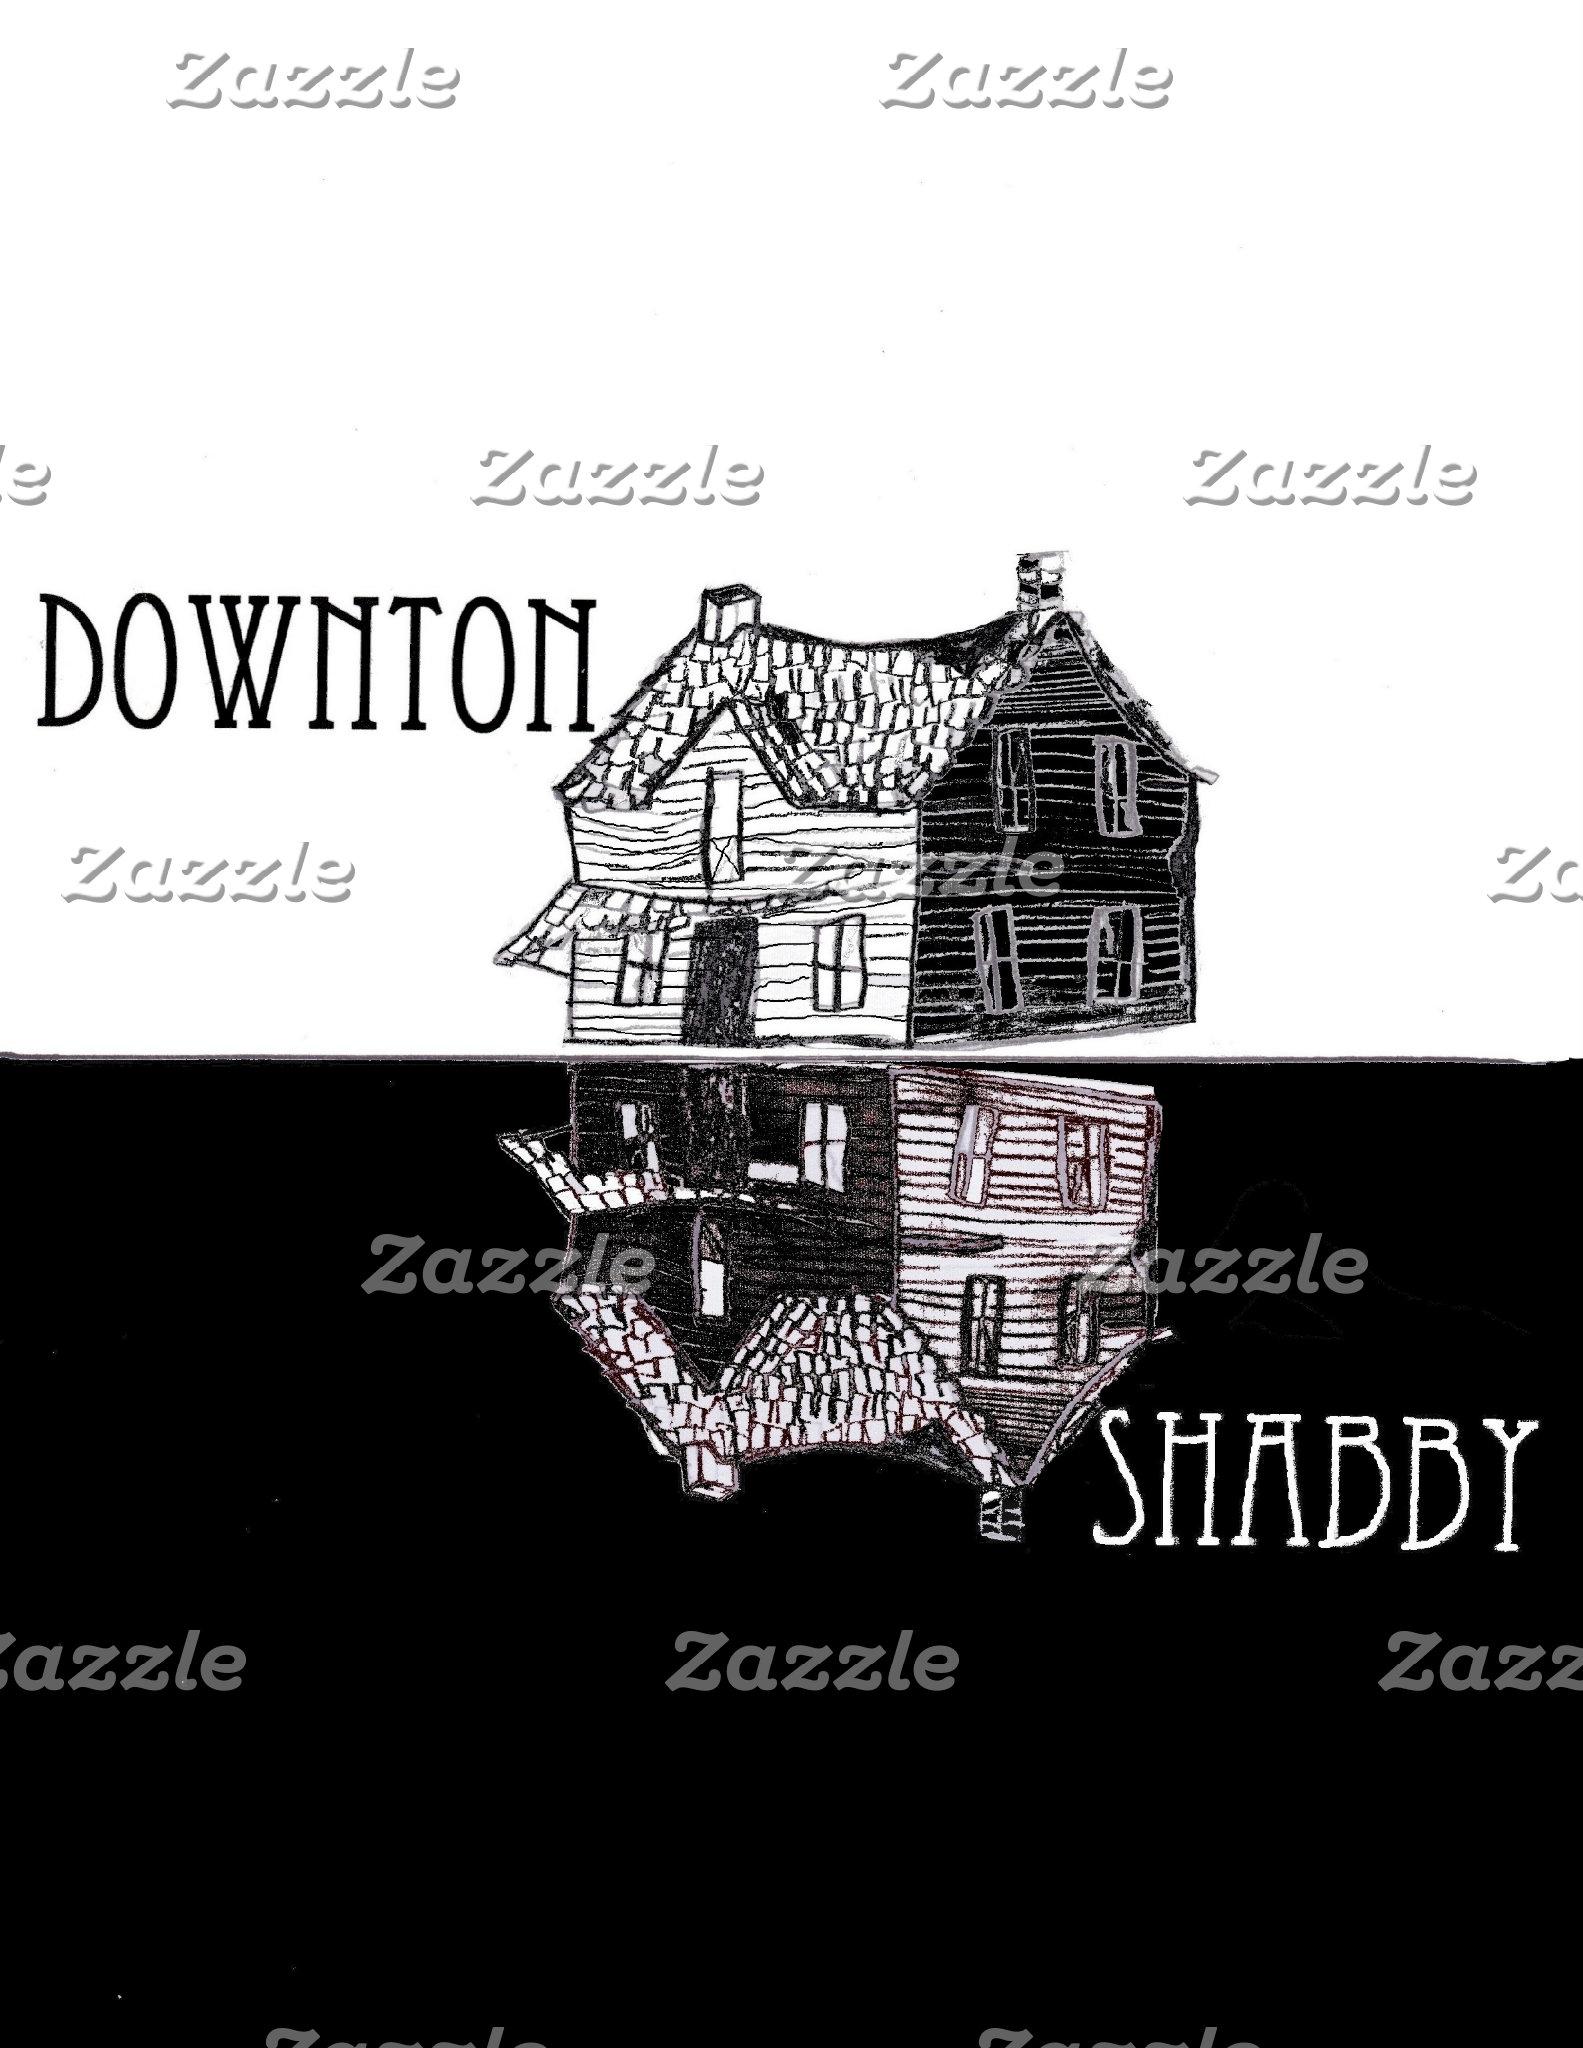 Downton Shabby